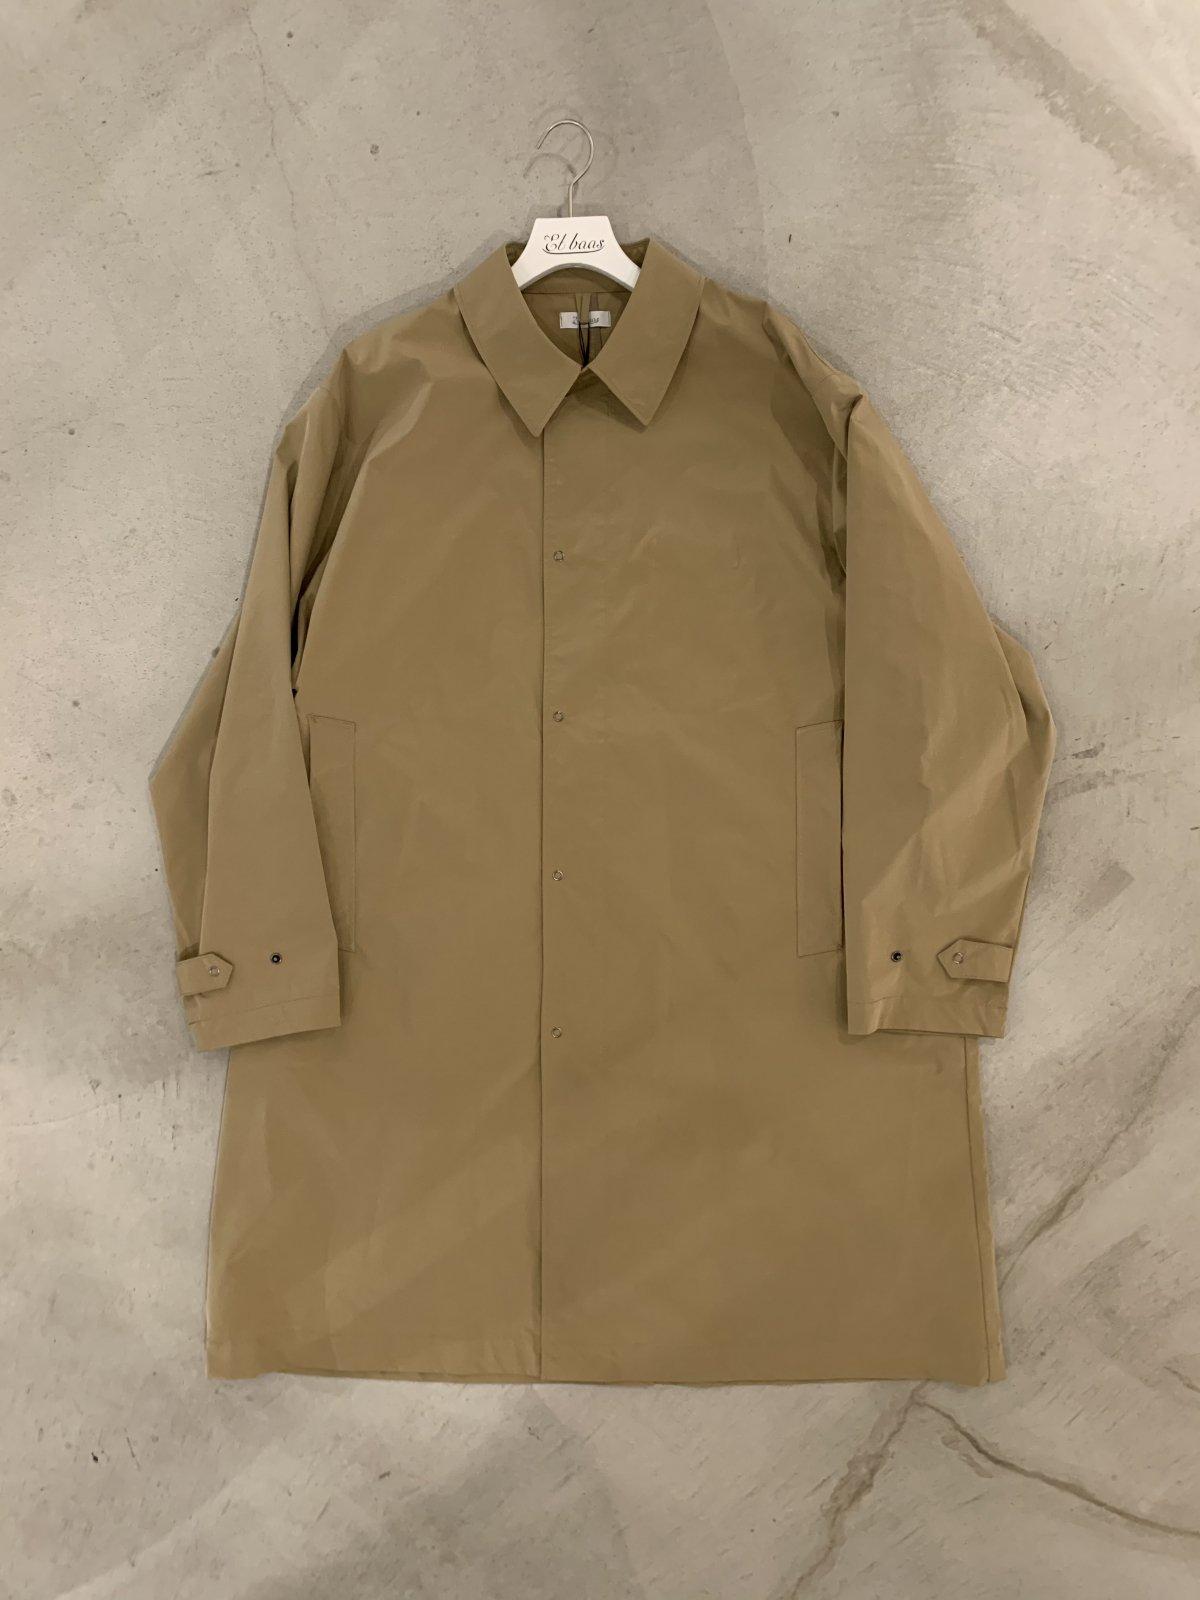 Et baas Comfy Coat 詳細画像10